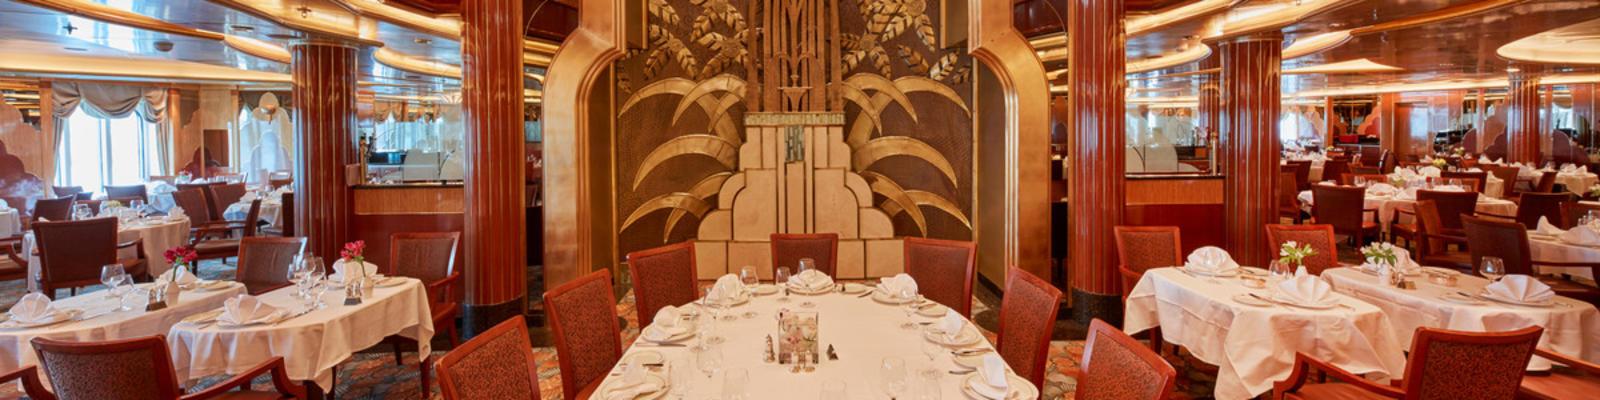 Cunard's Britannia Restaurant (Photo: Cunard)